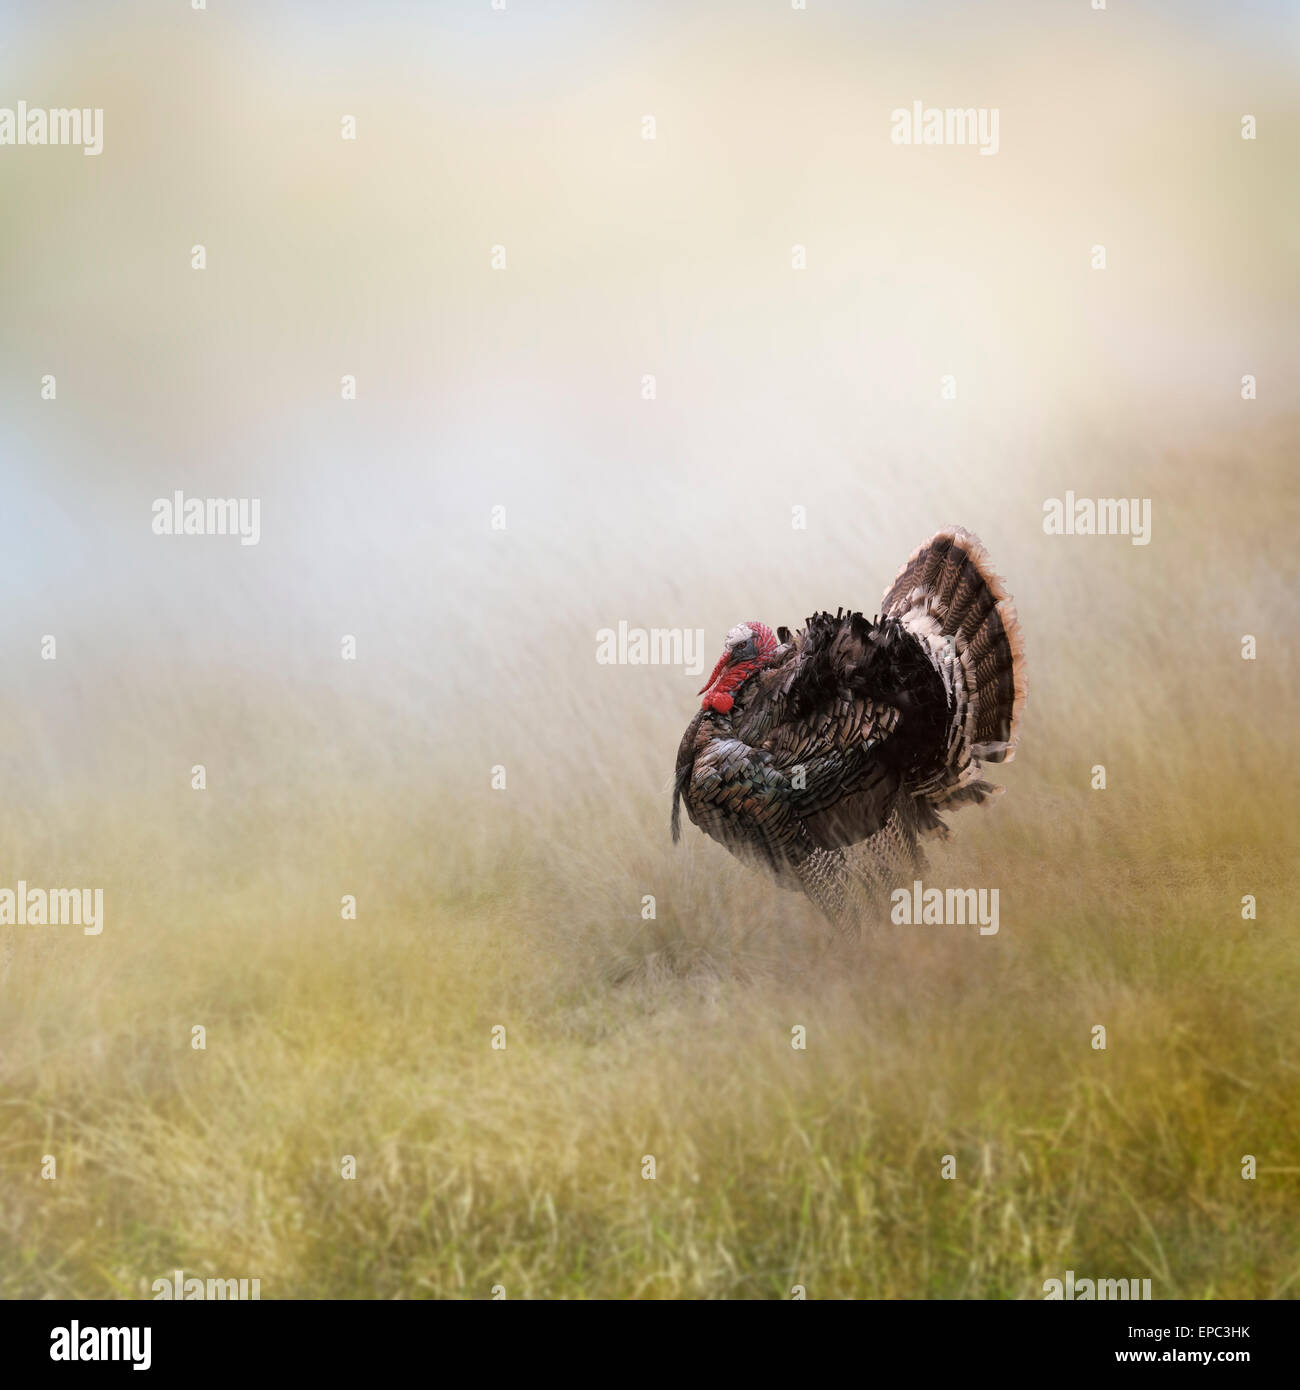 Türkei-Männchen In einem Feld Stockbild